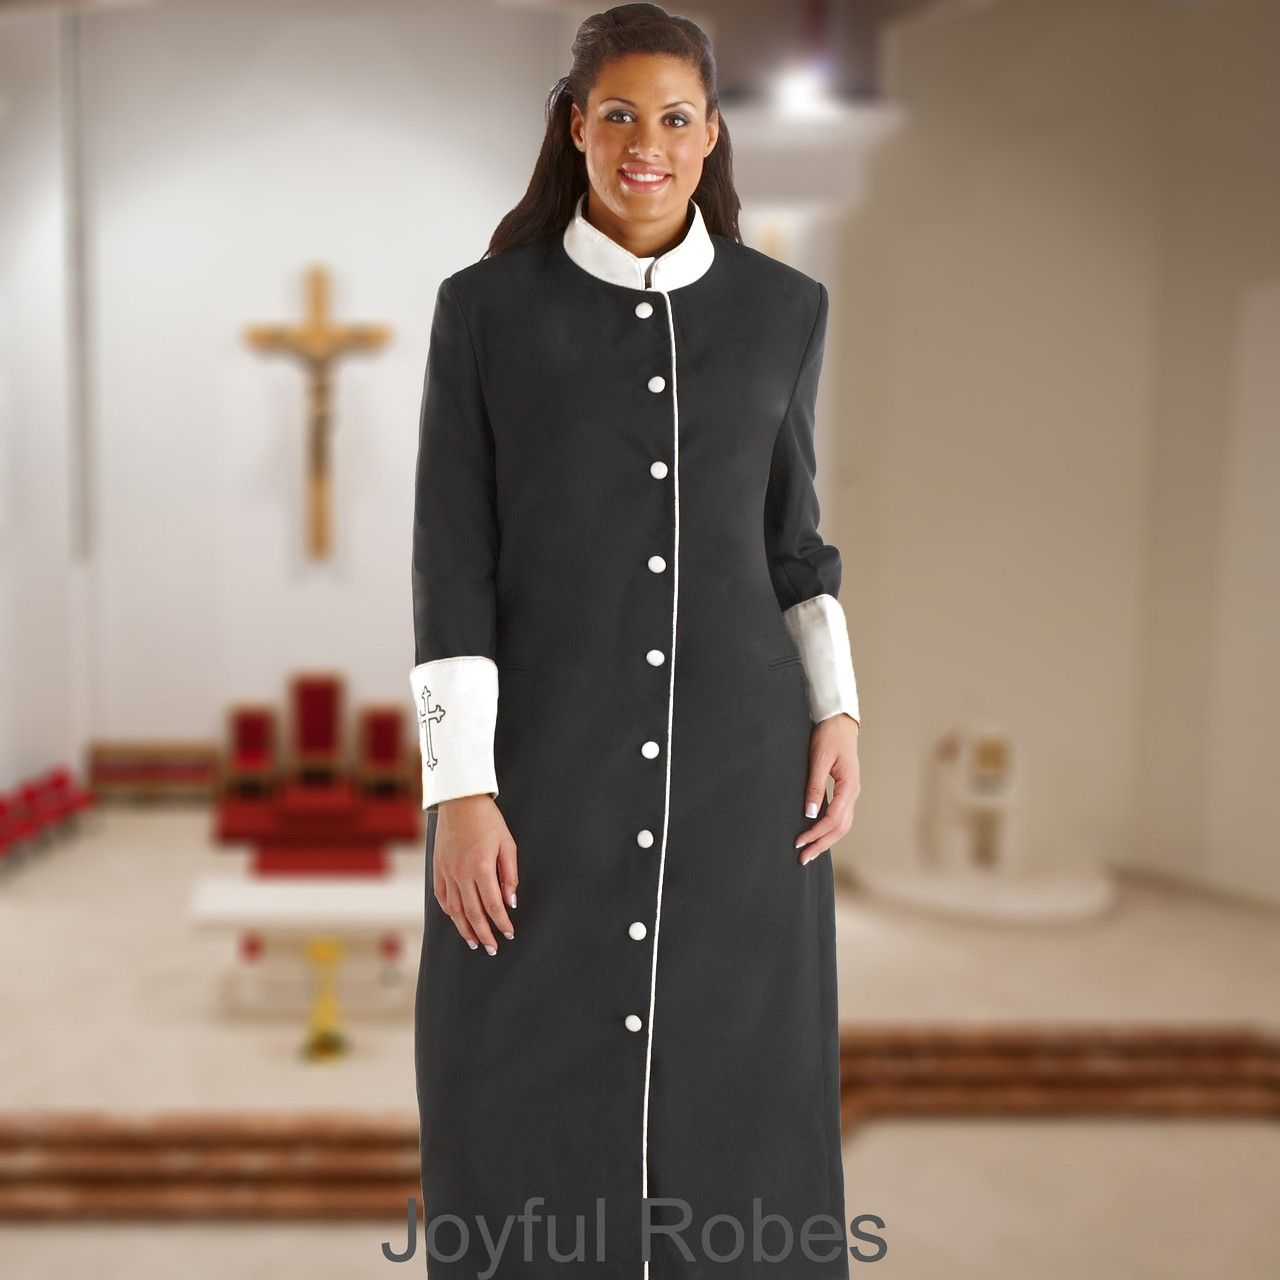 305 W. Women\'s Clergy/Pastor Robe - Black/White Cuff | Pastor ...